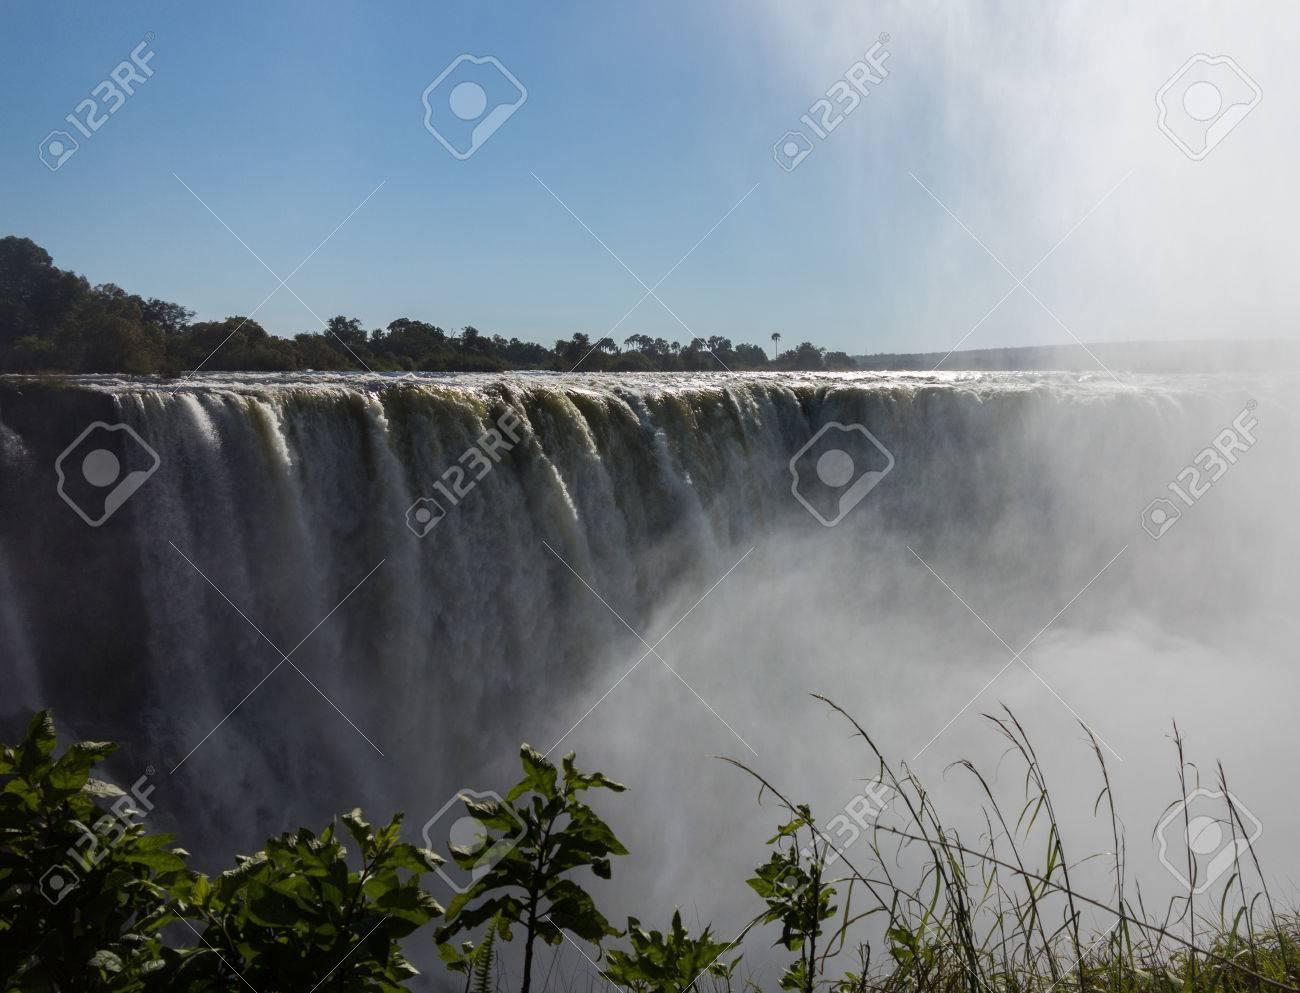 Exploring the Zambezi River